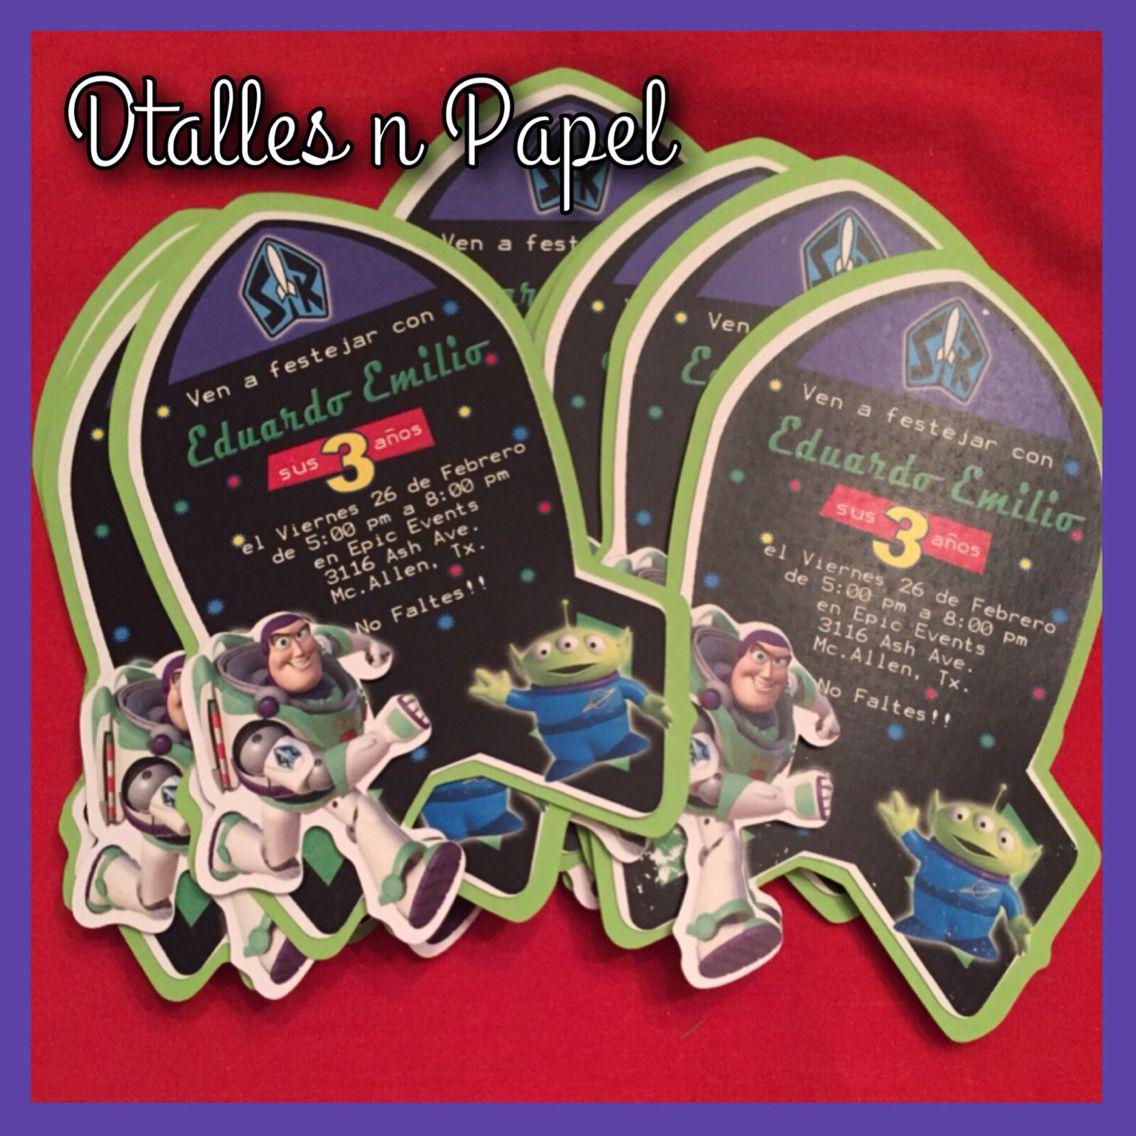 Buzz Lightyear Party Invitation 150 Fiesta De Toy Story